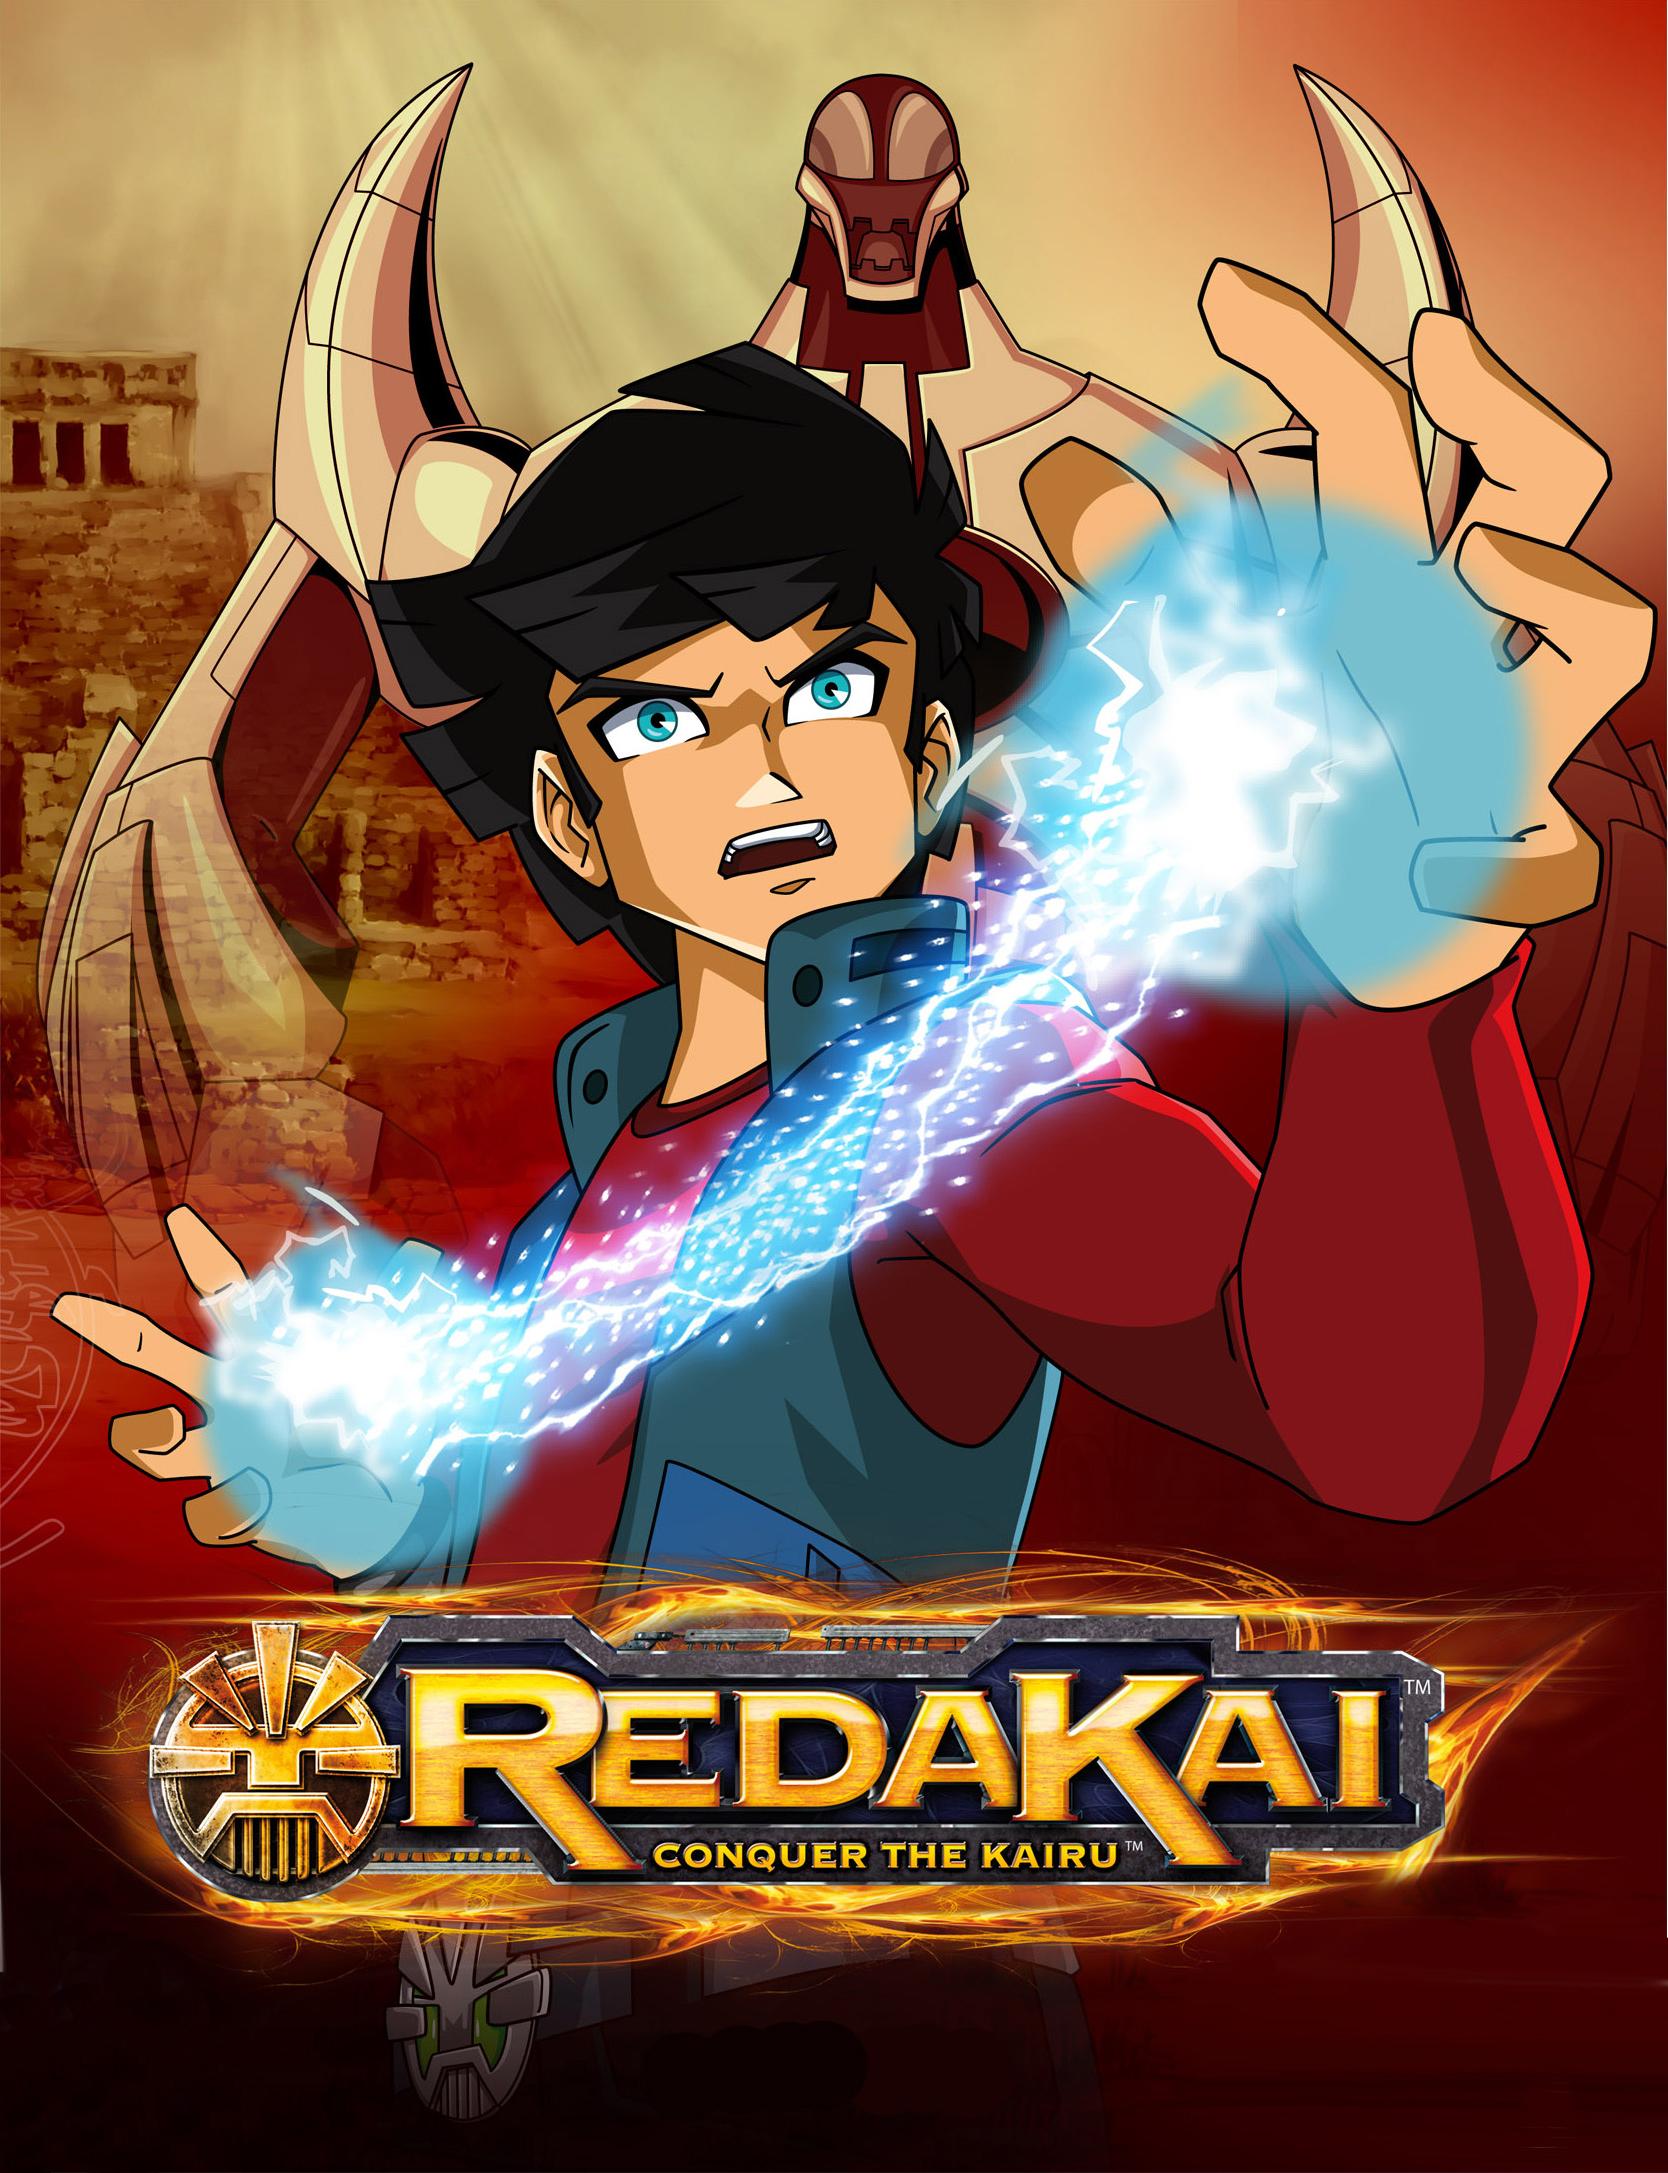 Zodiak S Redakai Continues Global Quest